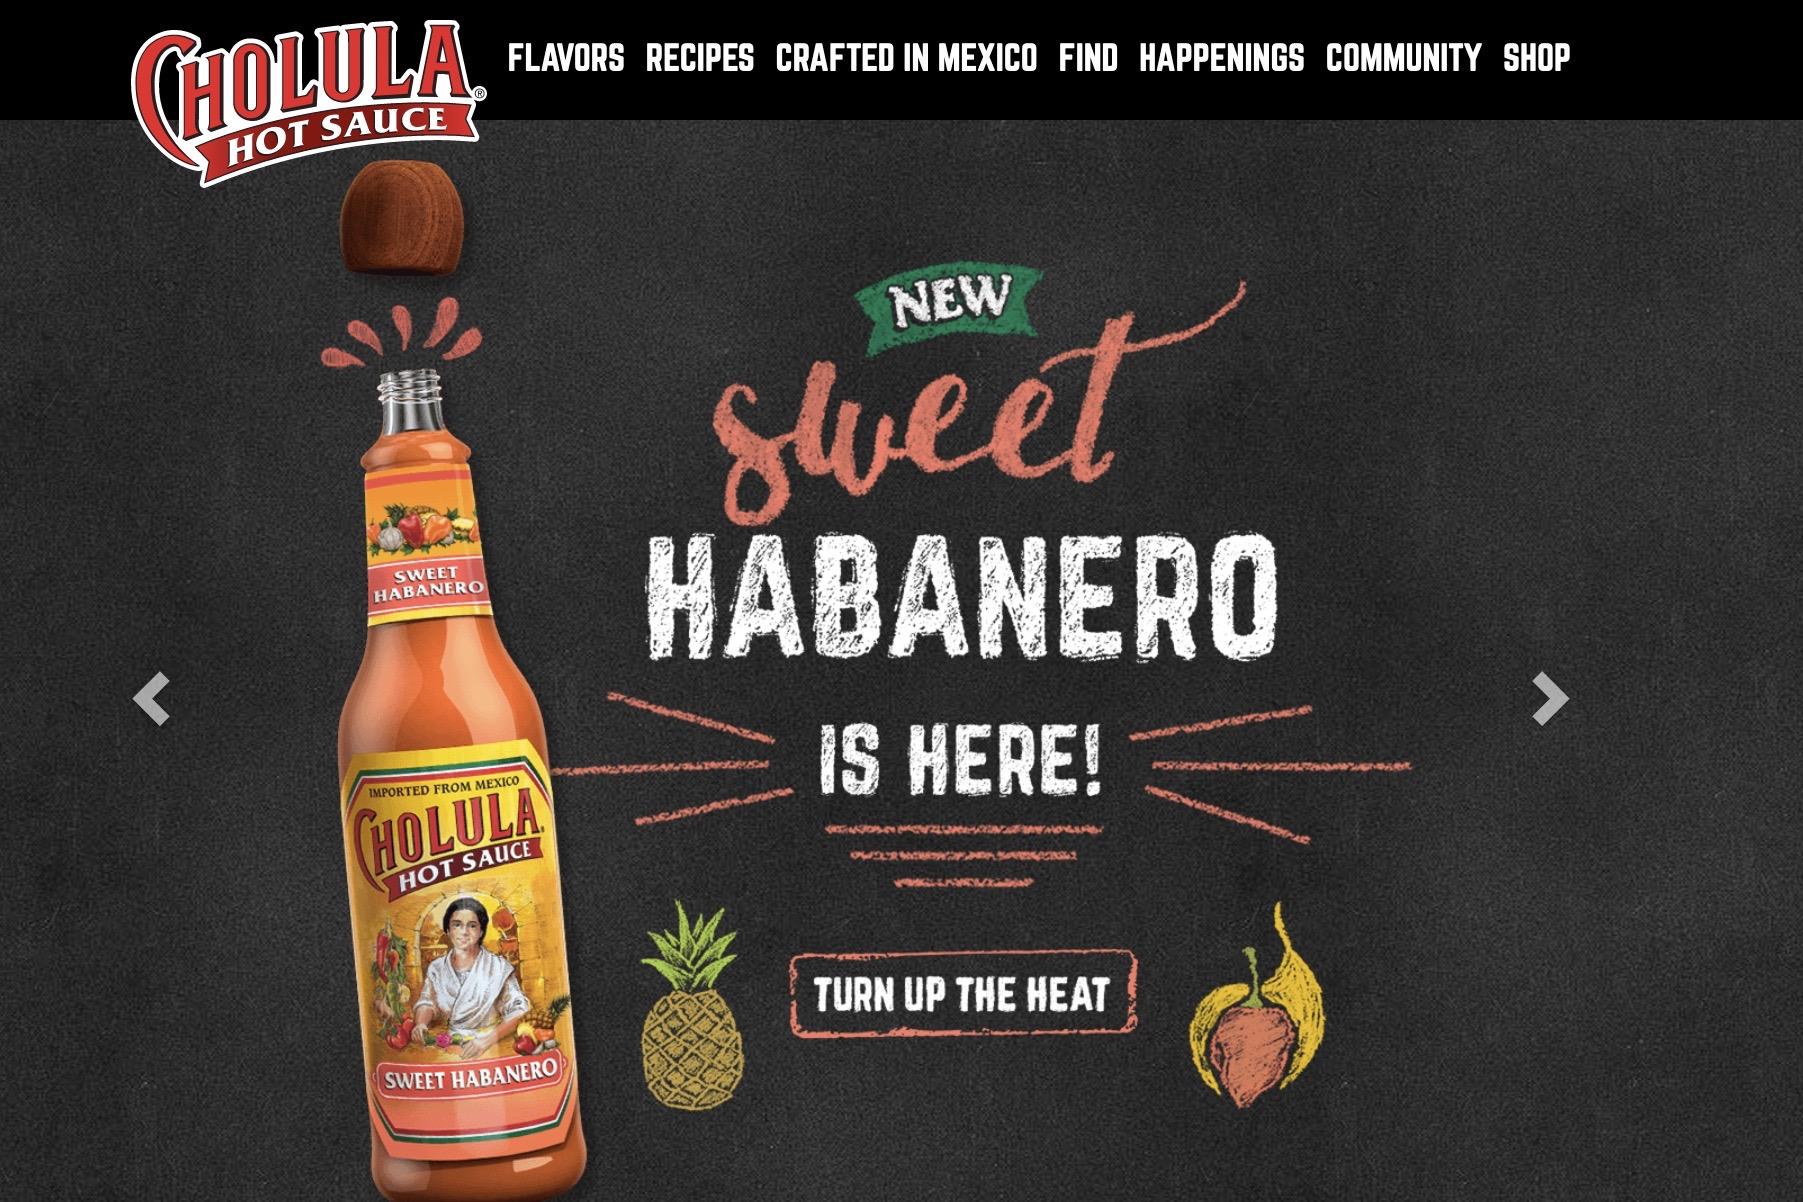 LVMH旗下基金8亿美元出售墨西哥辣酱品牌 Cholula,投资不满两年增值三倍!